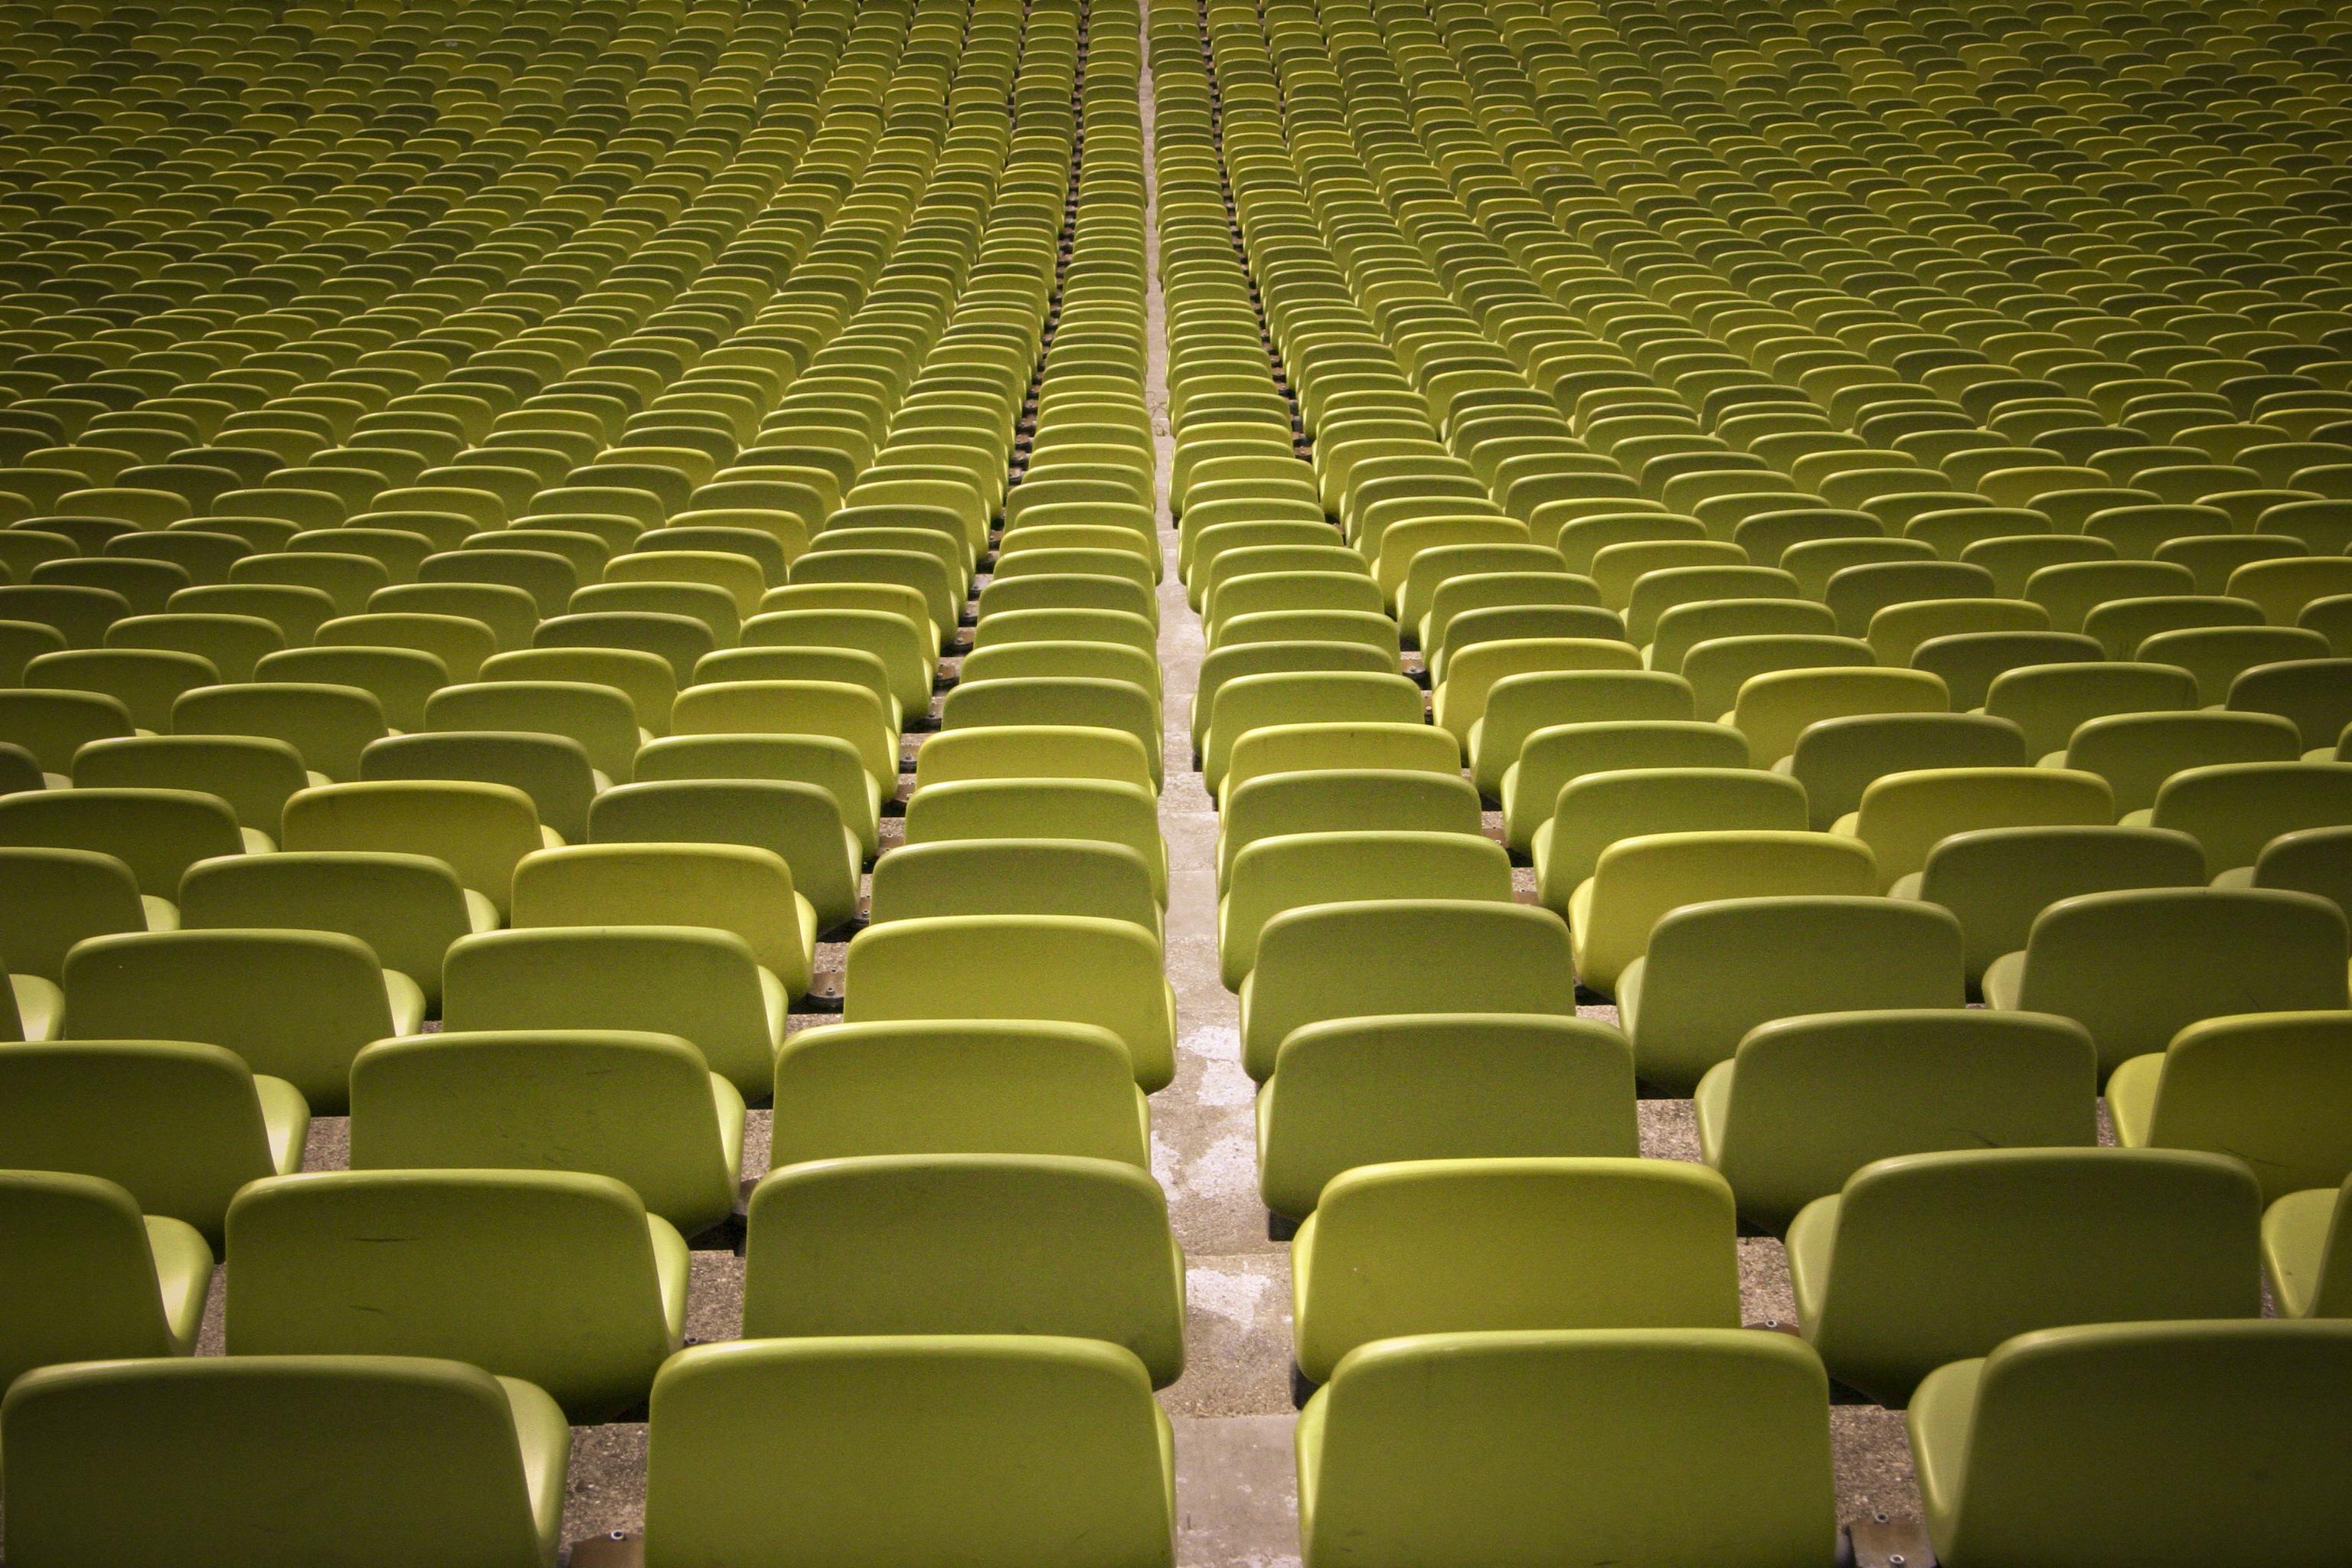 auditorium malraux lyon